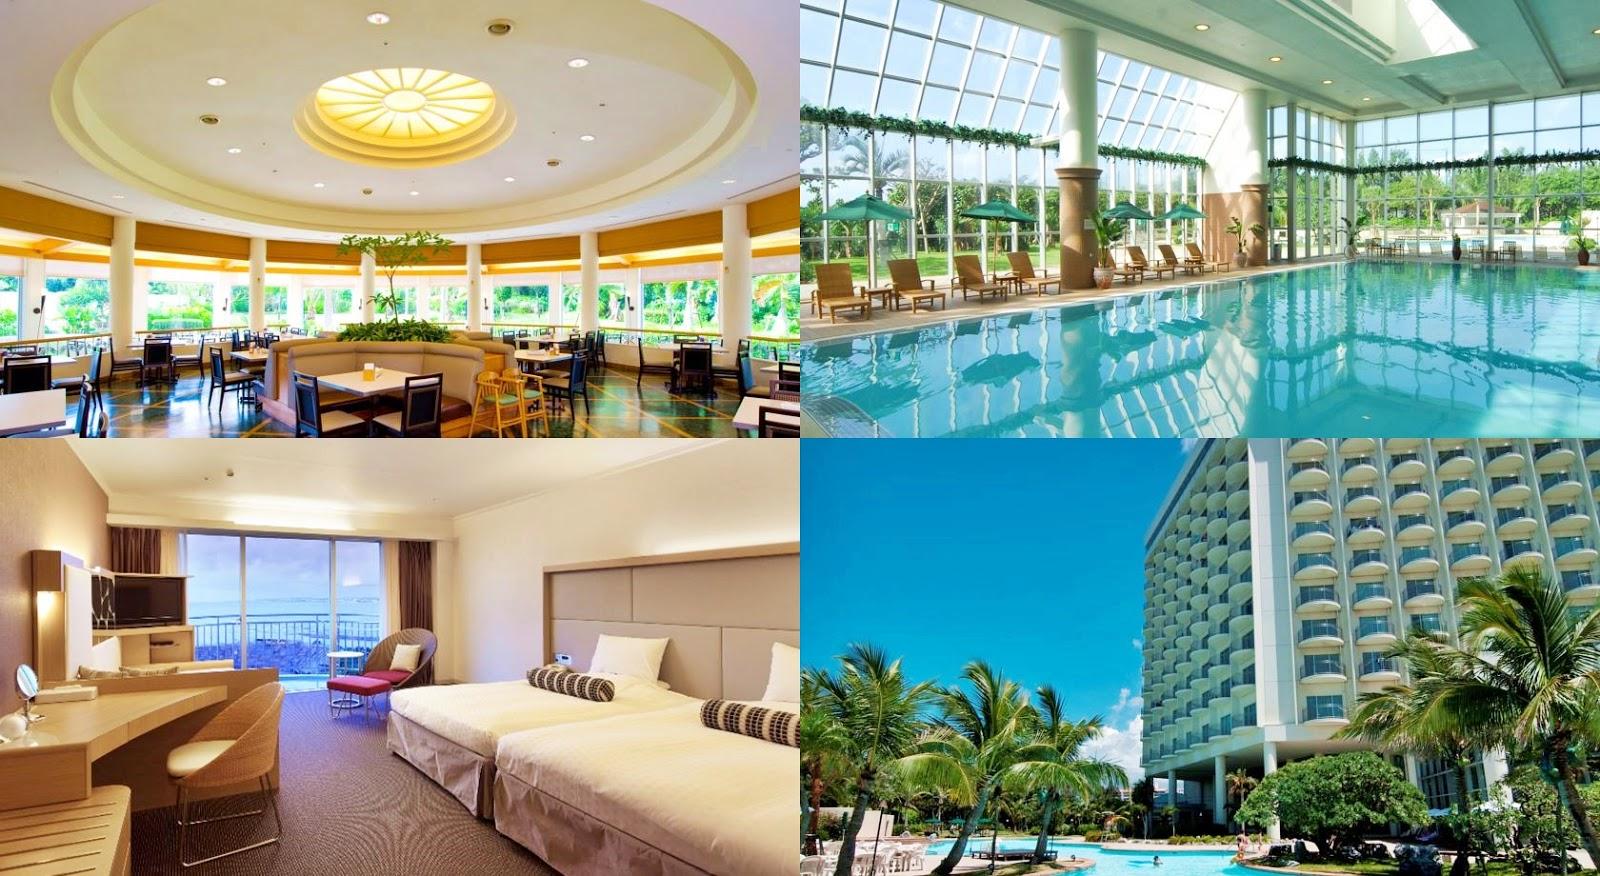 沖繩-住宿-推薦-拉格納花園酒店-Laguna-Garden-Hotel-Okinawa-hotel-recommendation